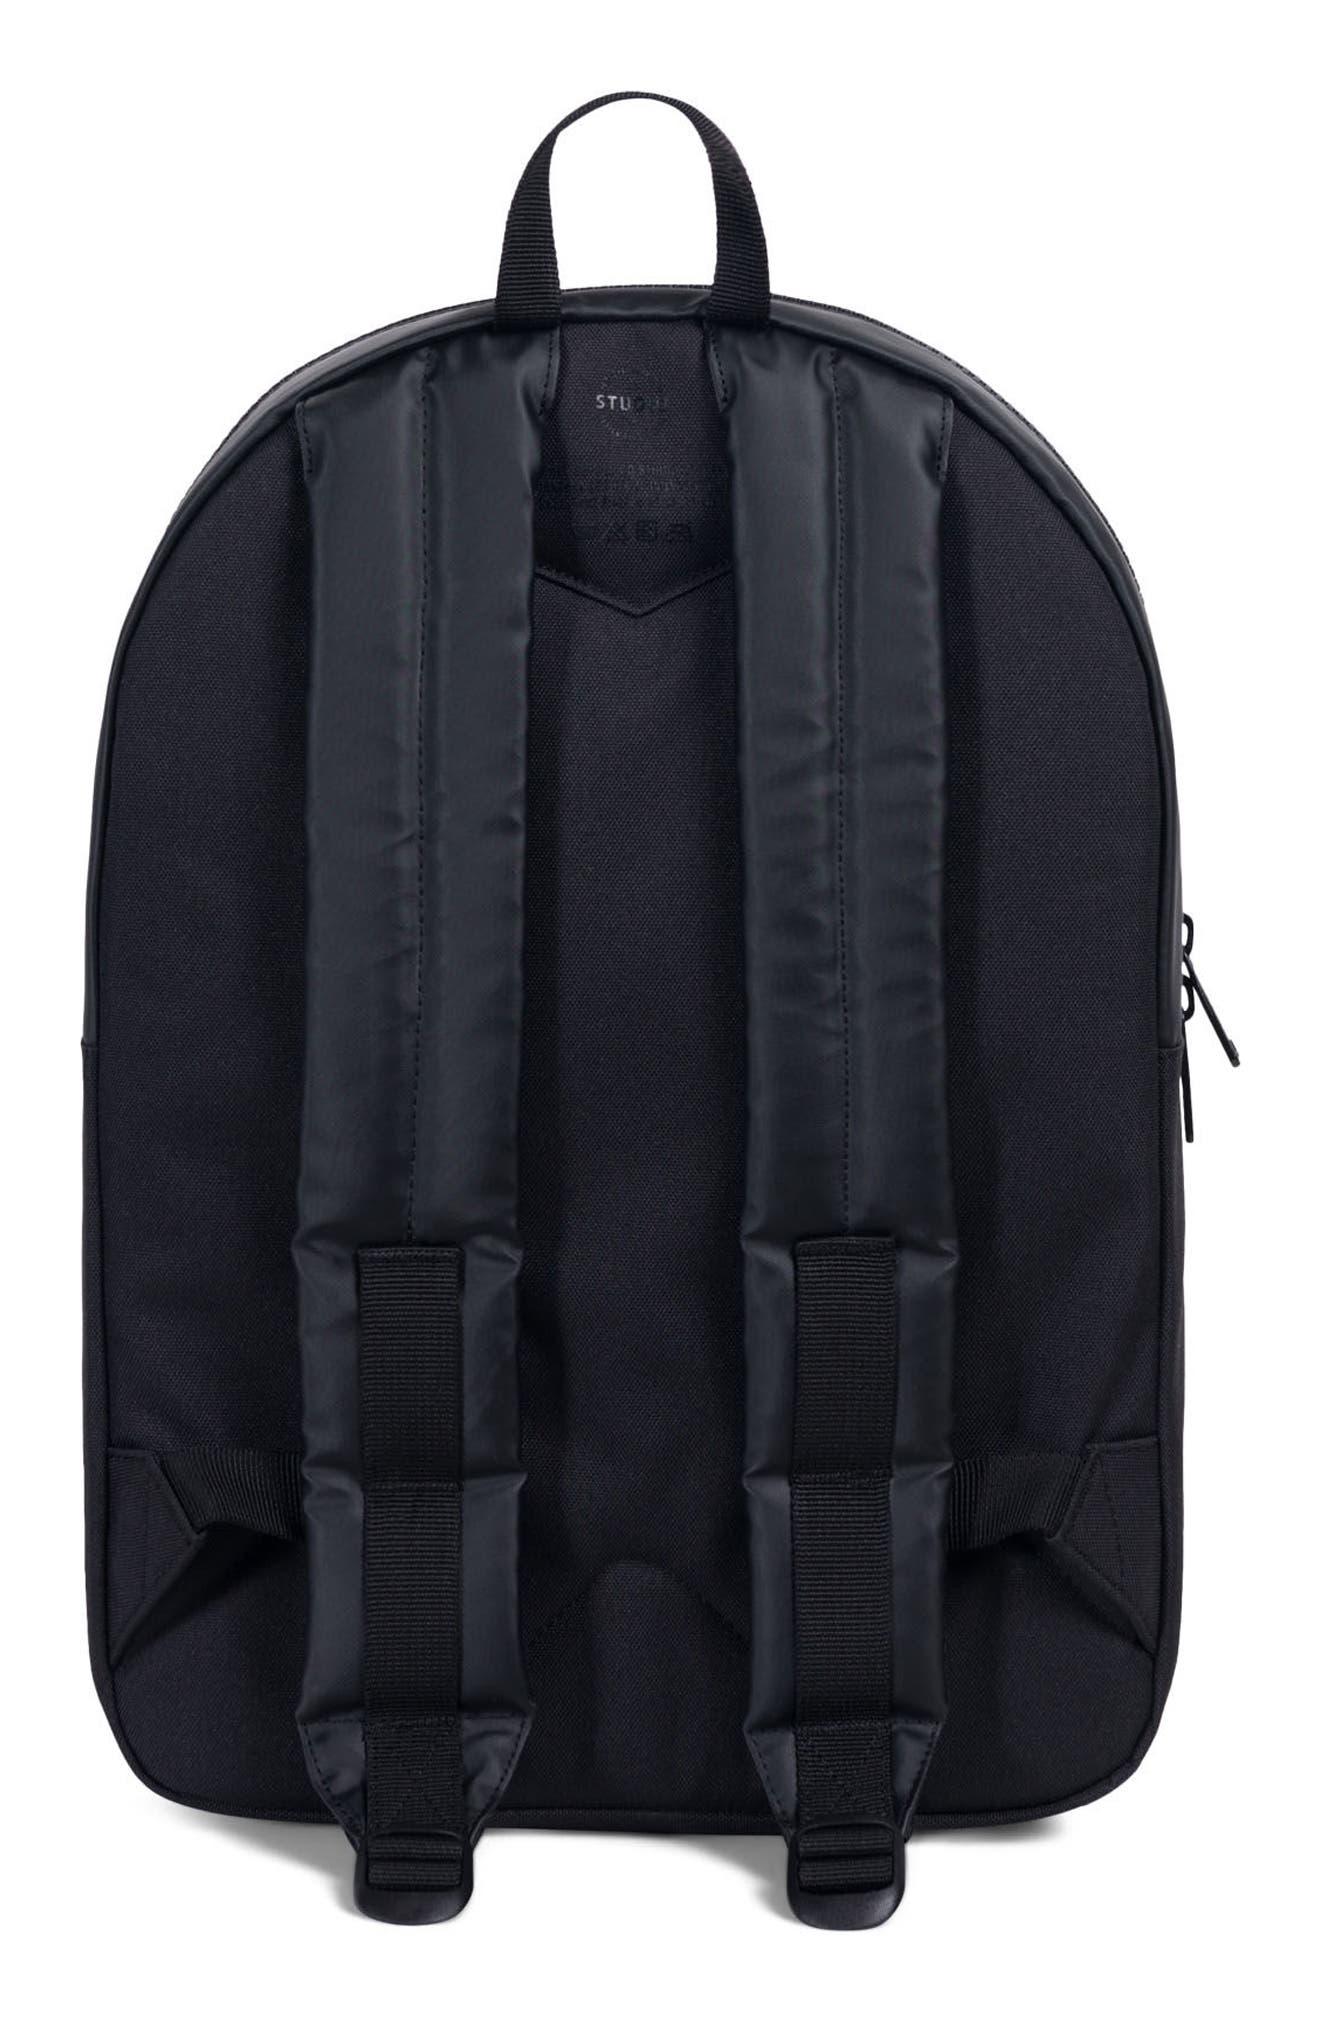 Winlaw Polycoat Studio Backpack,                             Alternate thumbnail 2, color,                             Black